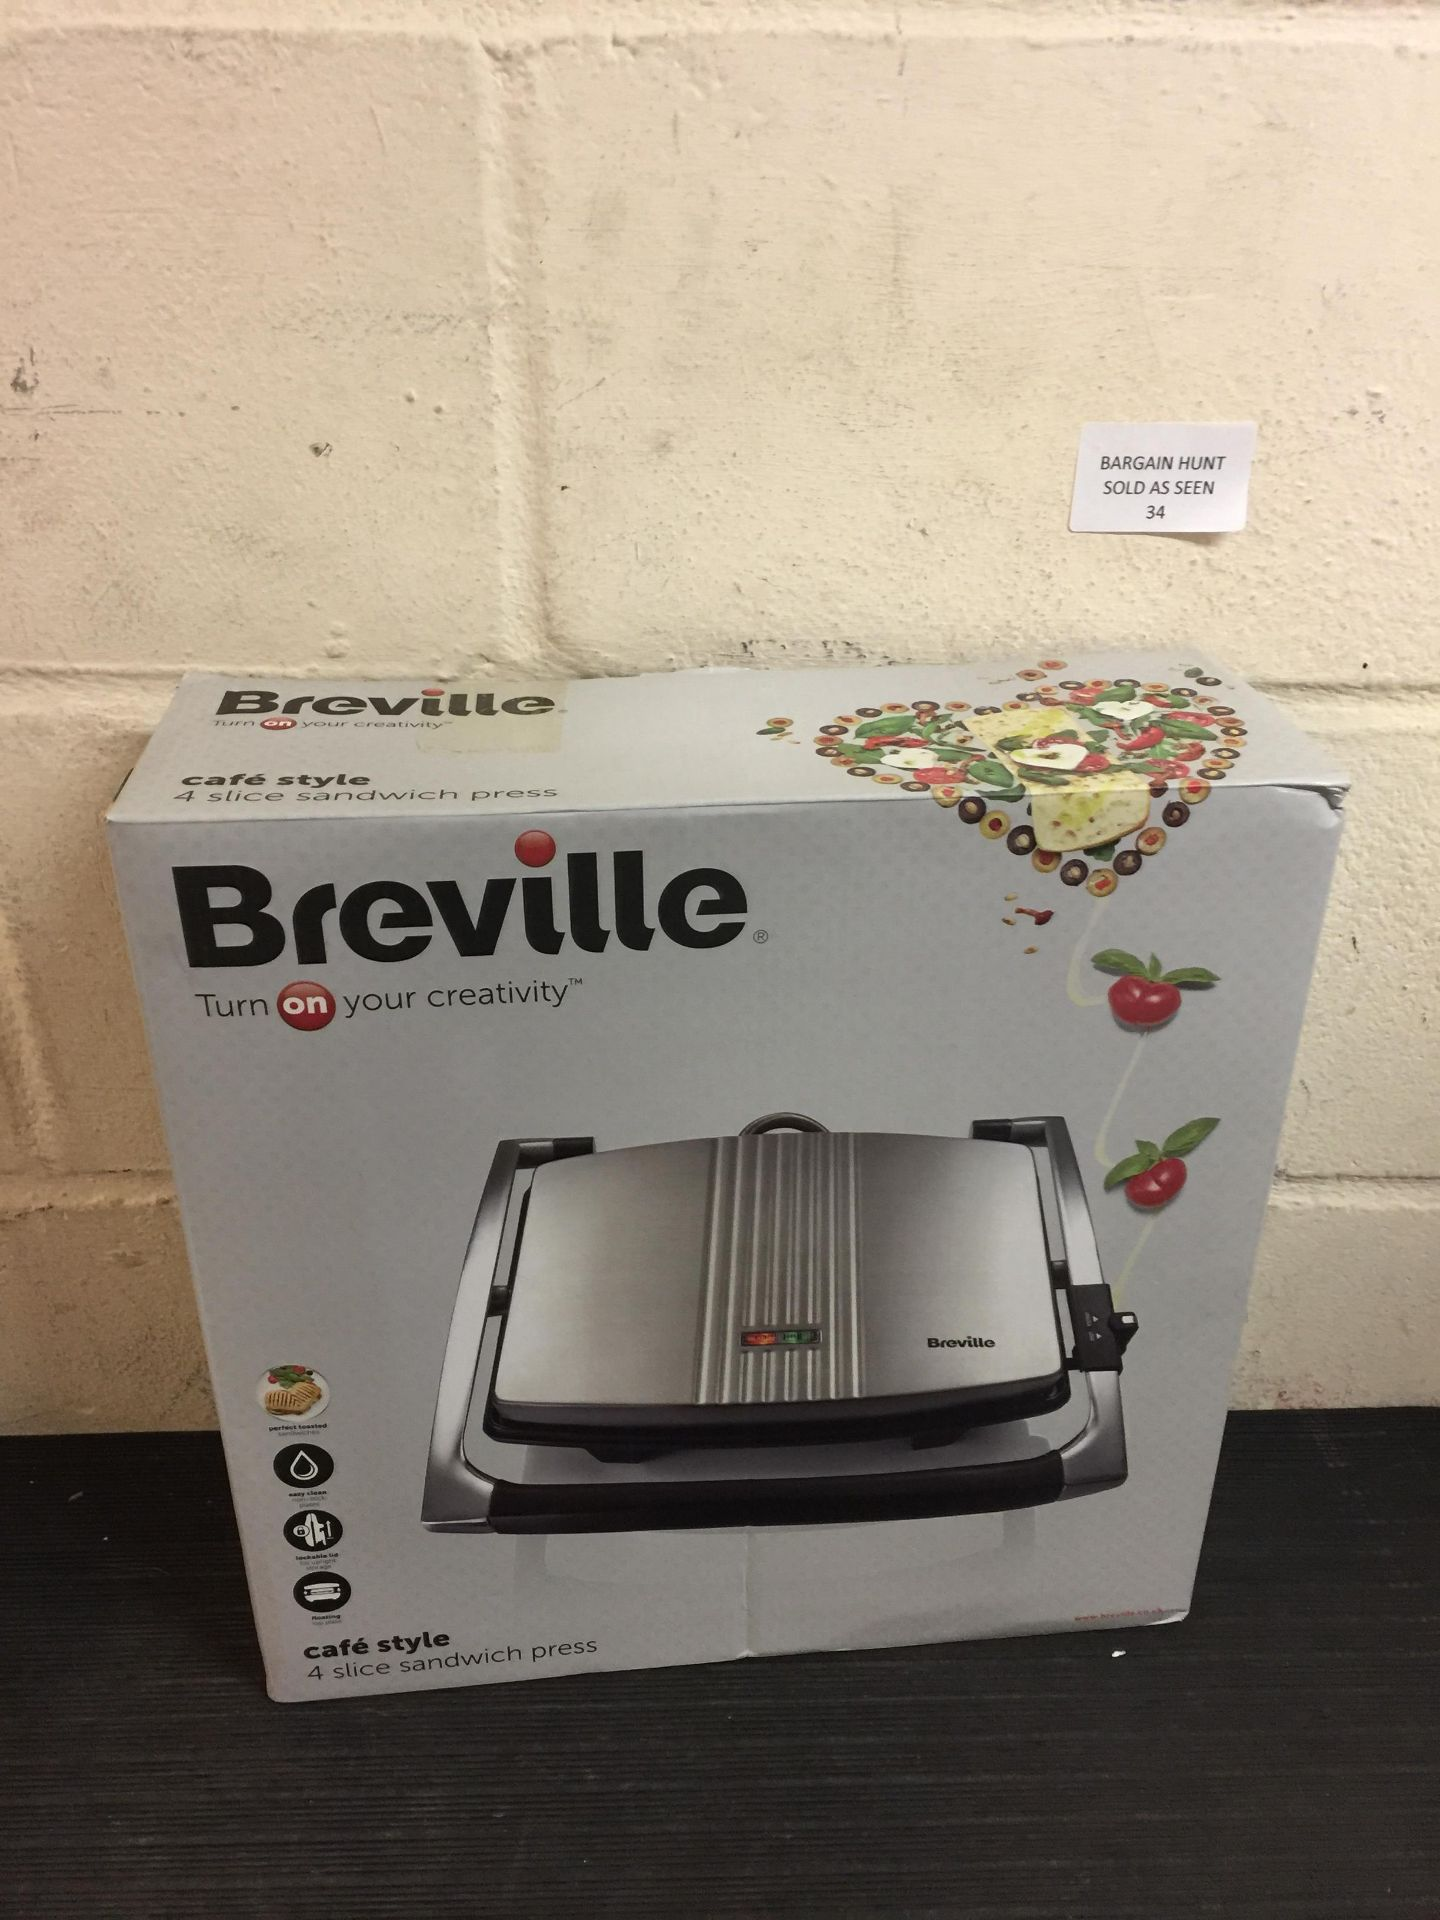 Lot 34 - Breville Sandwich Press